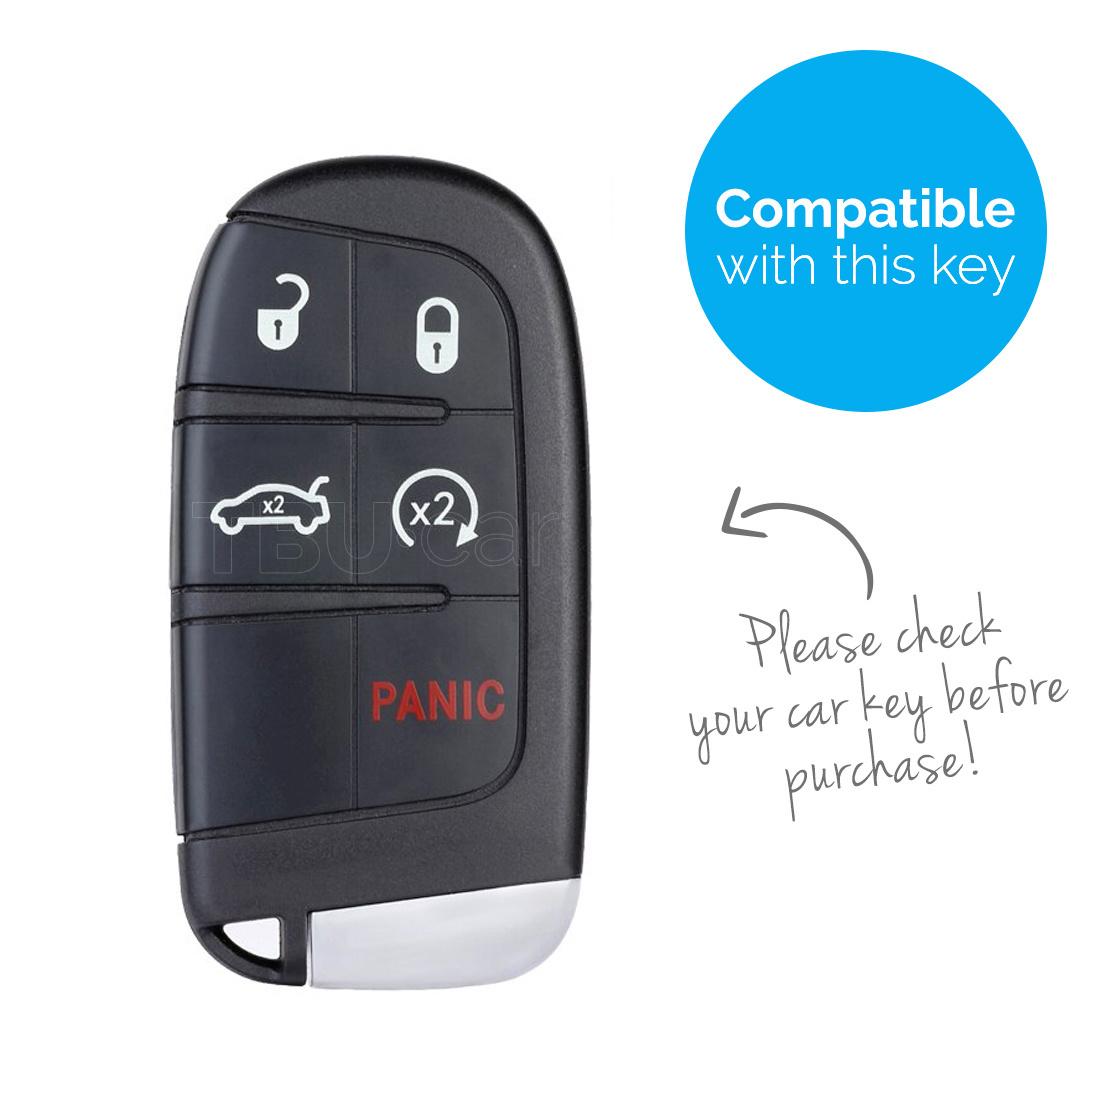 TBU car TBU car Autoschlüssel Hülle kompatibel mit Fiat 5 Tasten (Keyless Entry) - Schutzhülle aus TPU - Auto Schlüsselhülle Cover in Gold